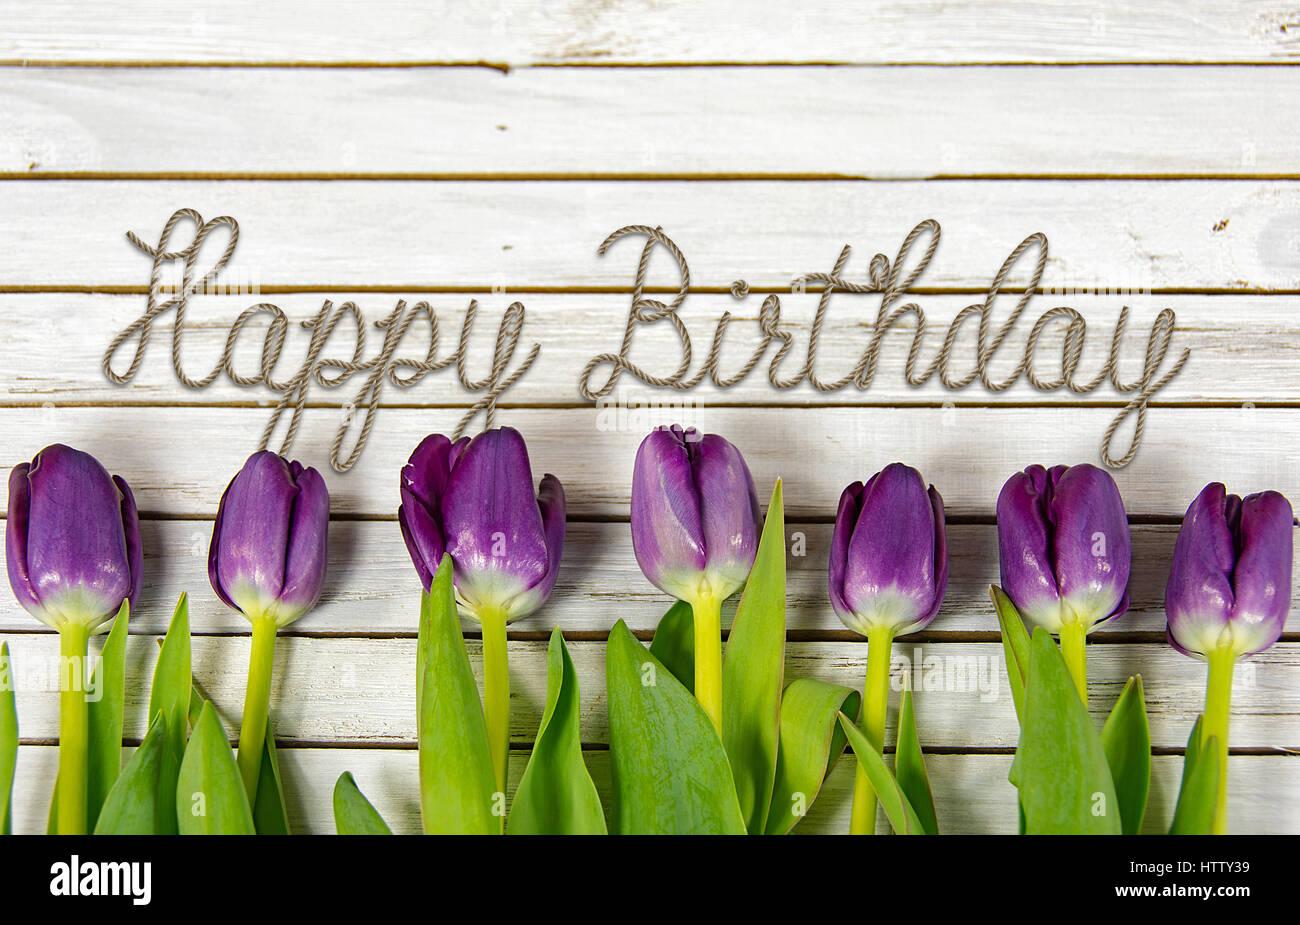 Happy birthday purple flowers images flower wallpaper hd happy birthday message in rope design with purple tulips on stock happy birthday message in rope izmirmasajfo